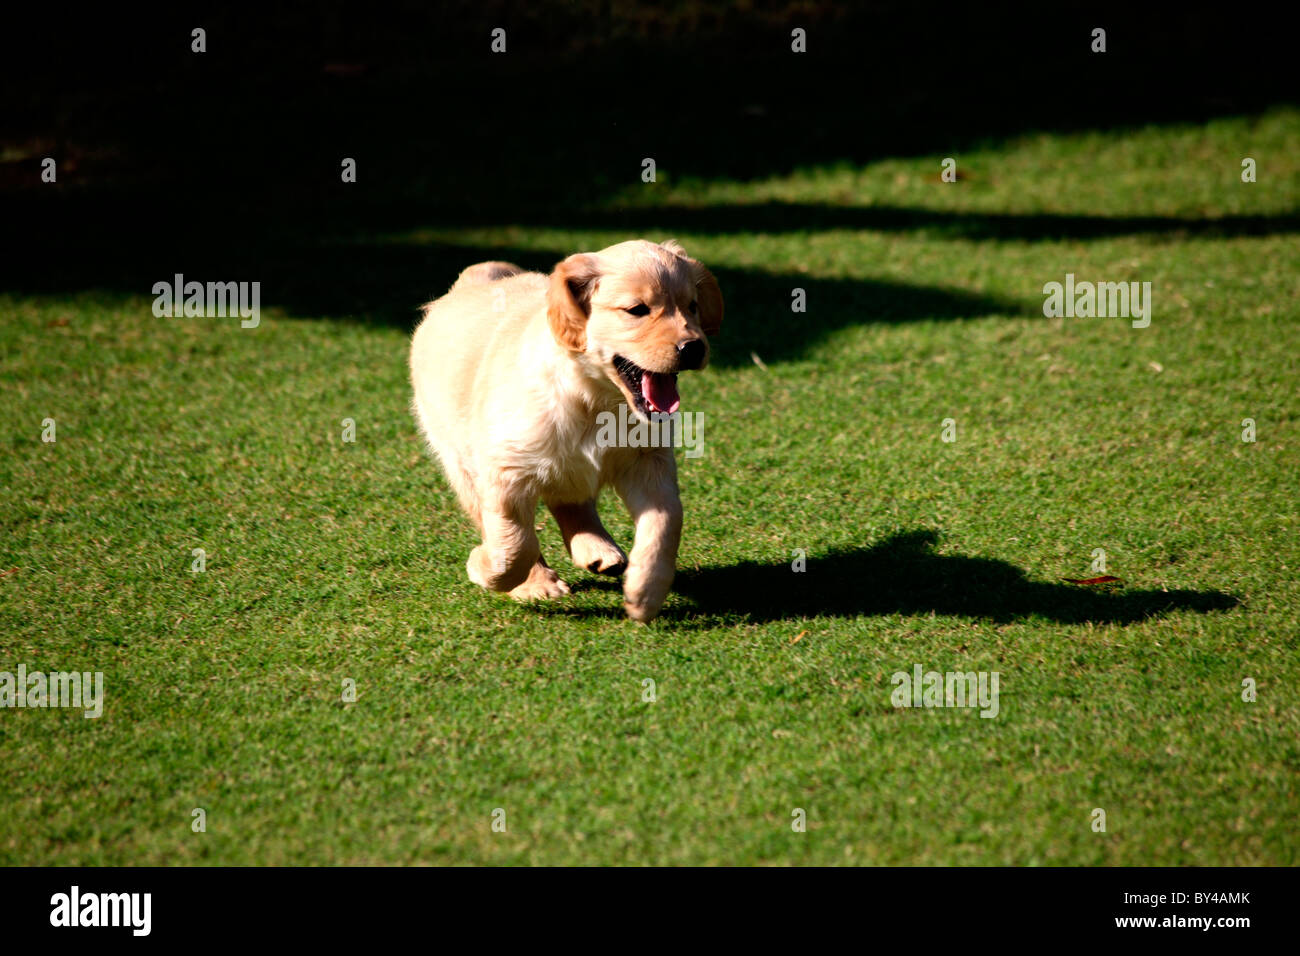 A Golden Retriever Puppy Running On Lawan Stock Photo 33902307 Alamy